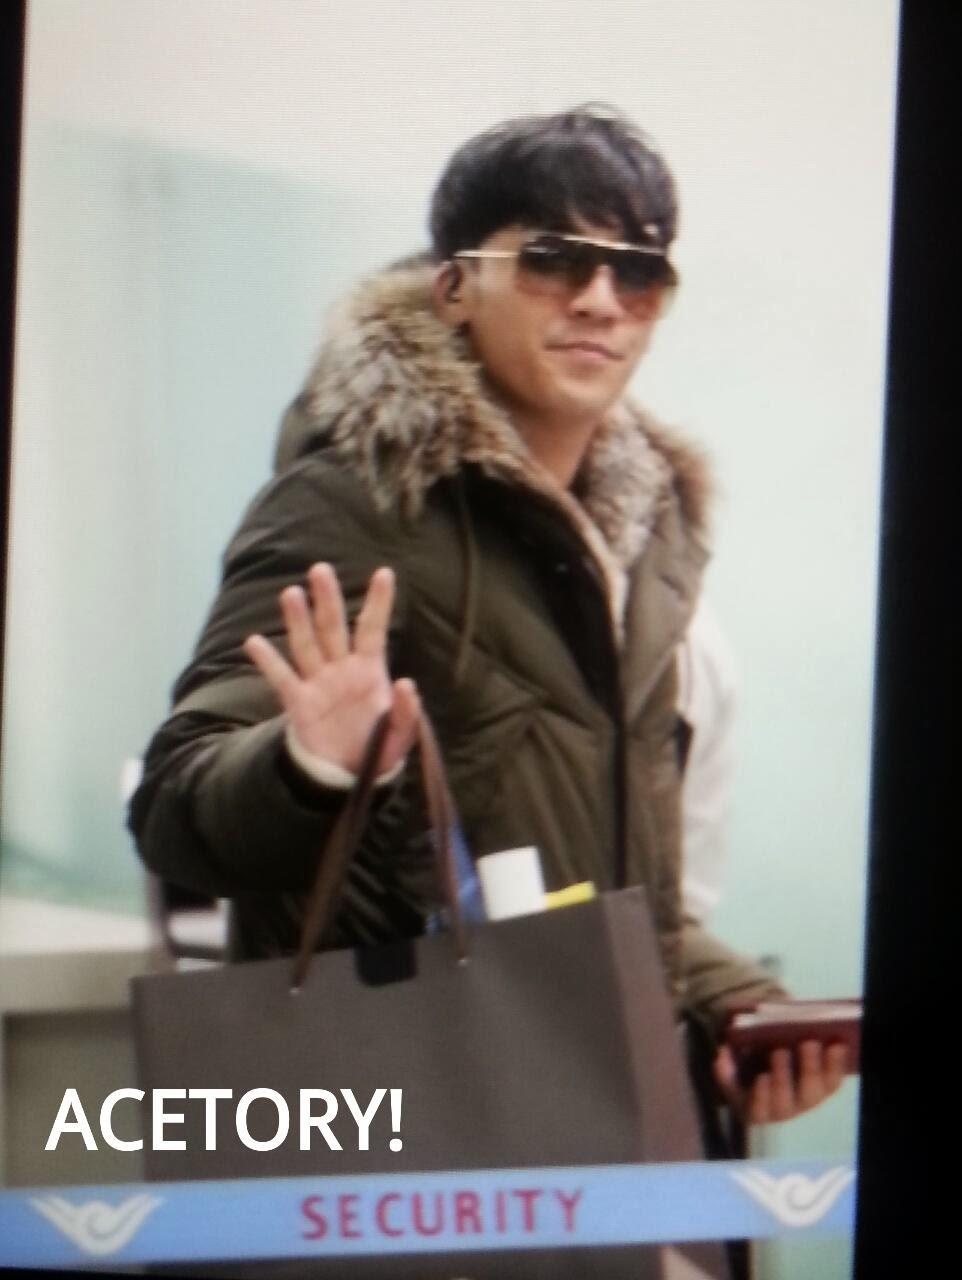 Big Bang - Incheon Airport - 13dec2013 - Seung Ri - Fan - Acetory - 03.jpg